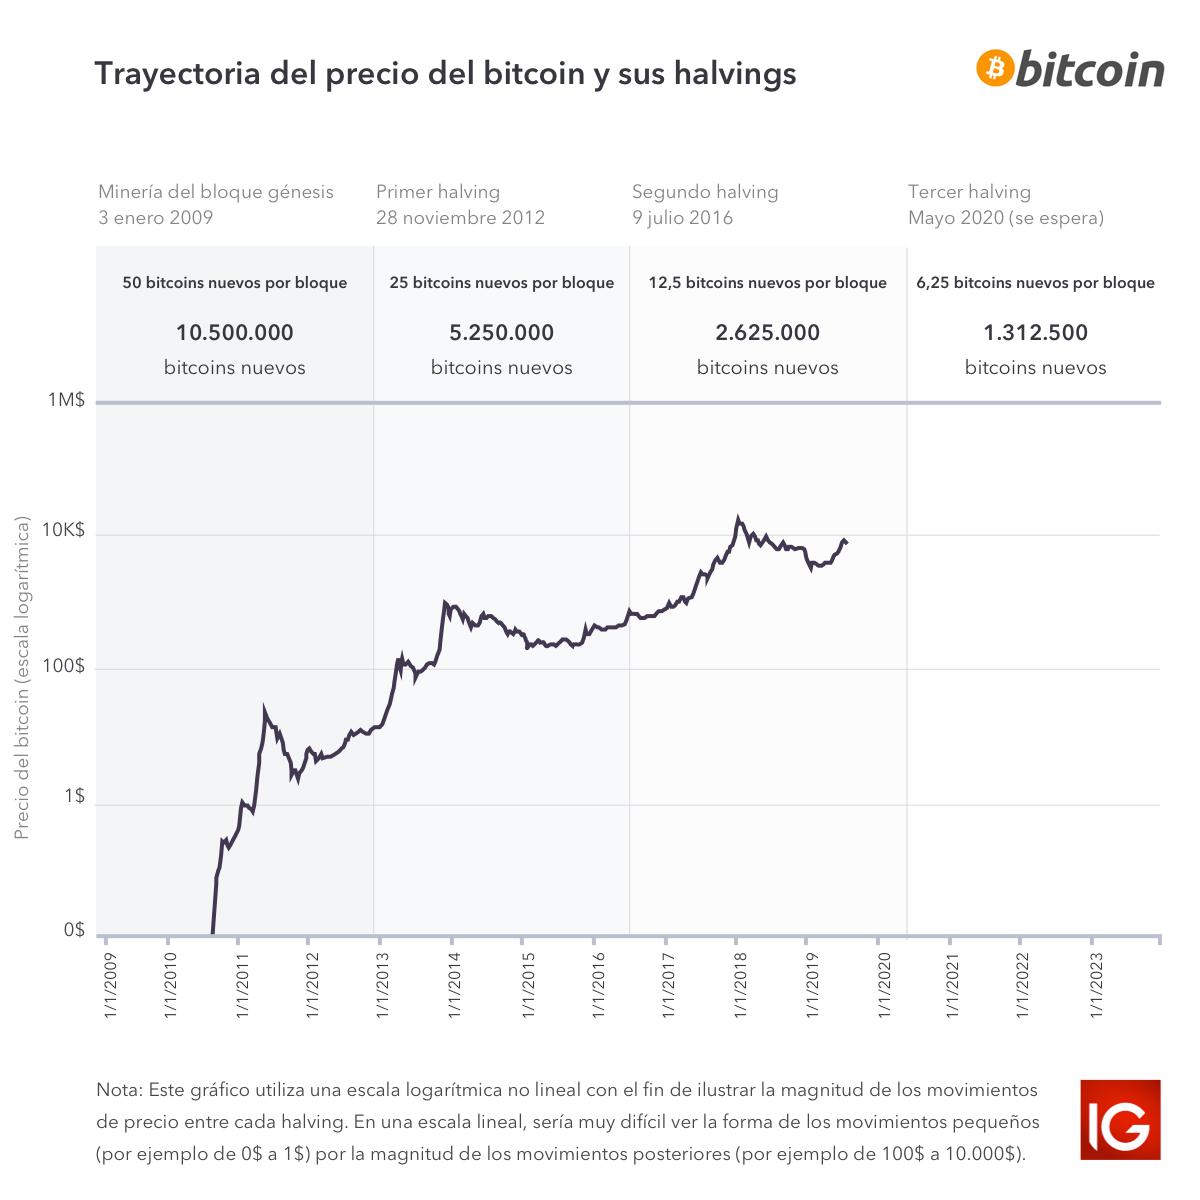 Minado de bitcoins definition setanta sports betting